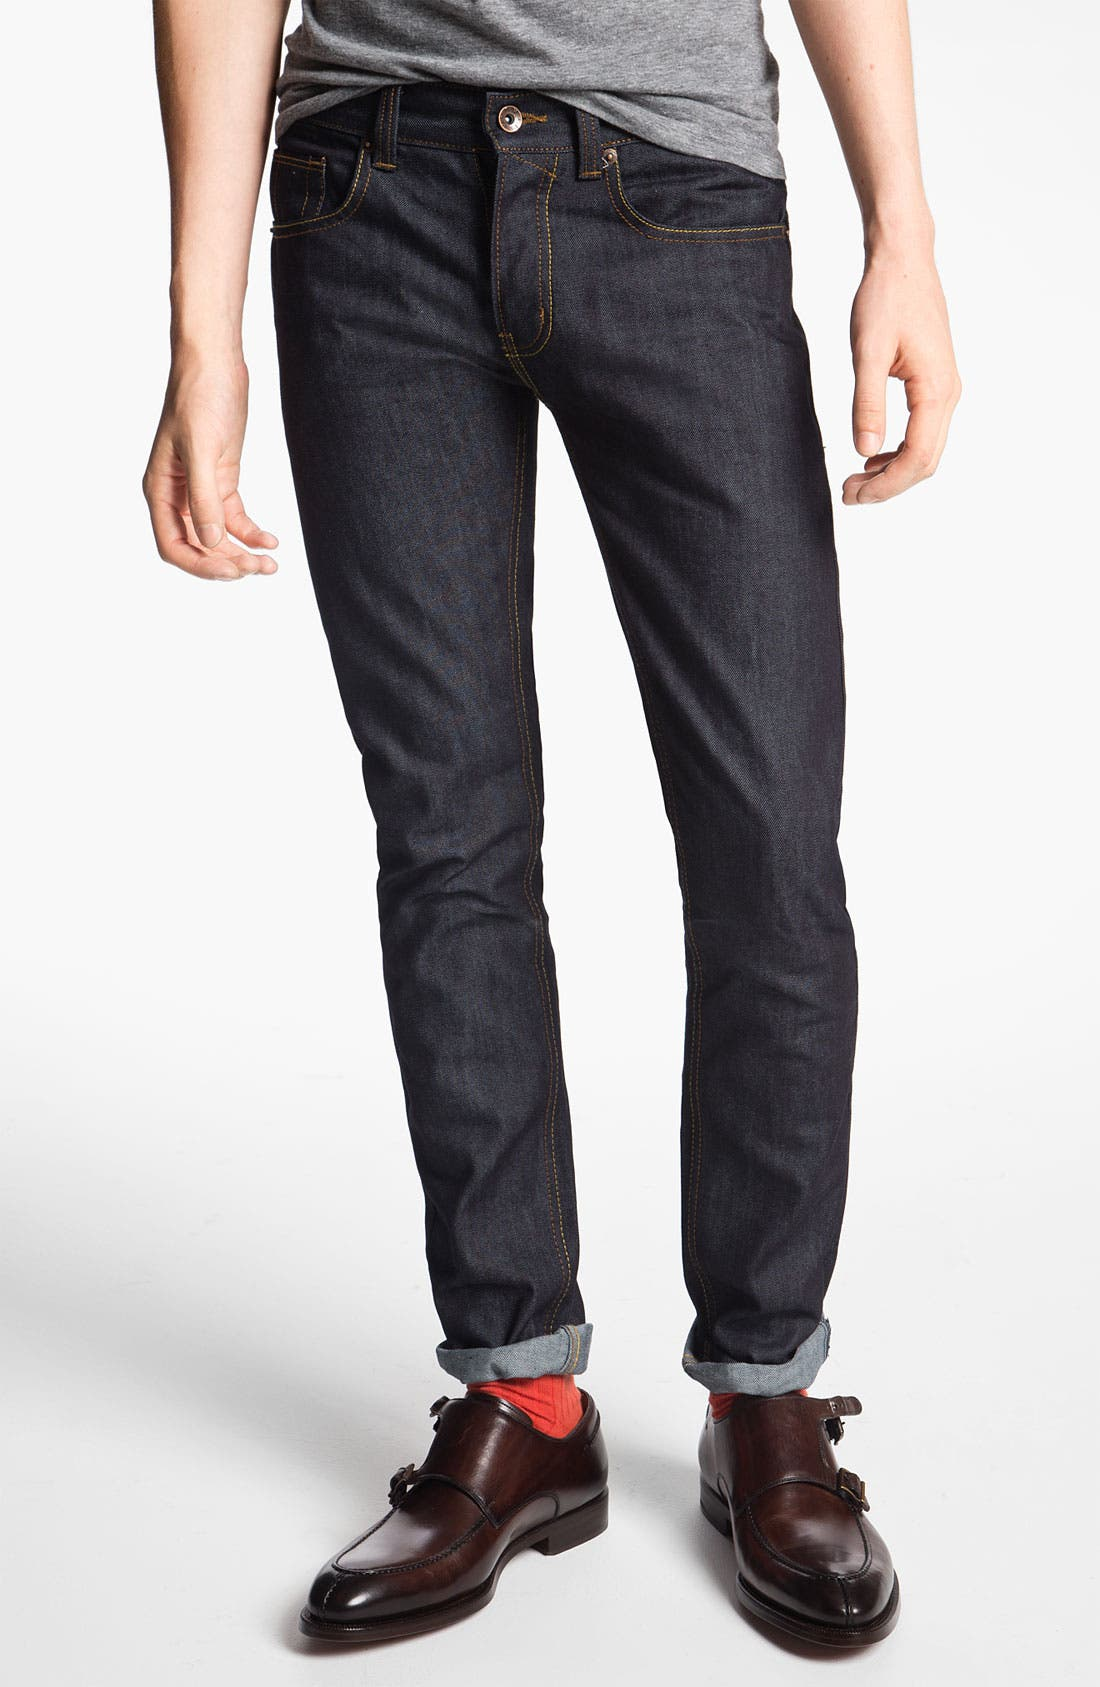 Alternate Image 1 Selected - Topman 'Flynn' Skinny Jeans (Indigo)